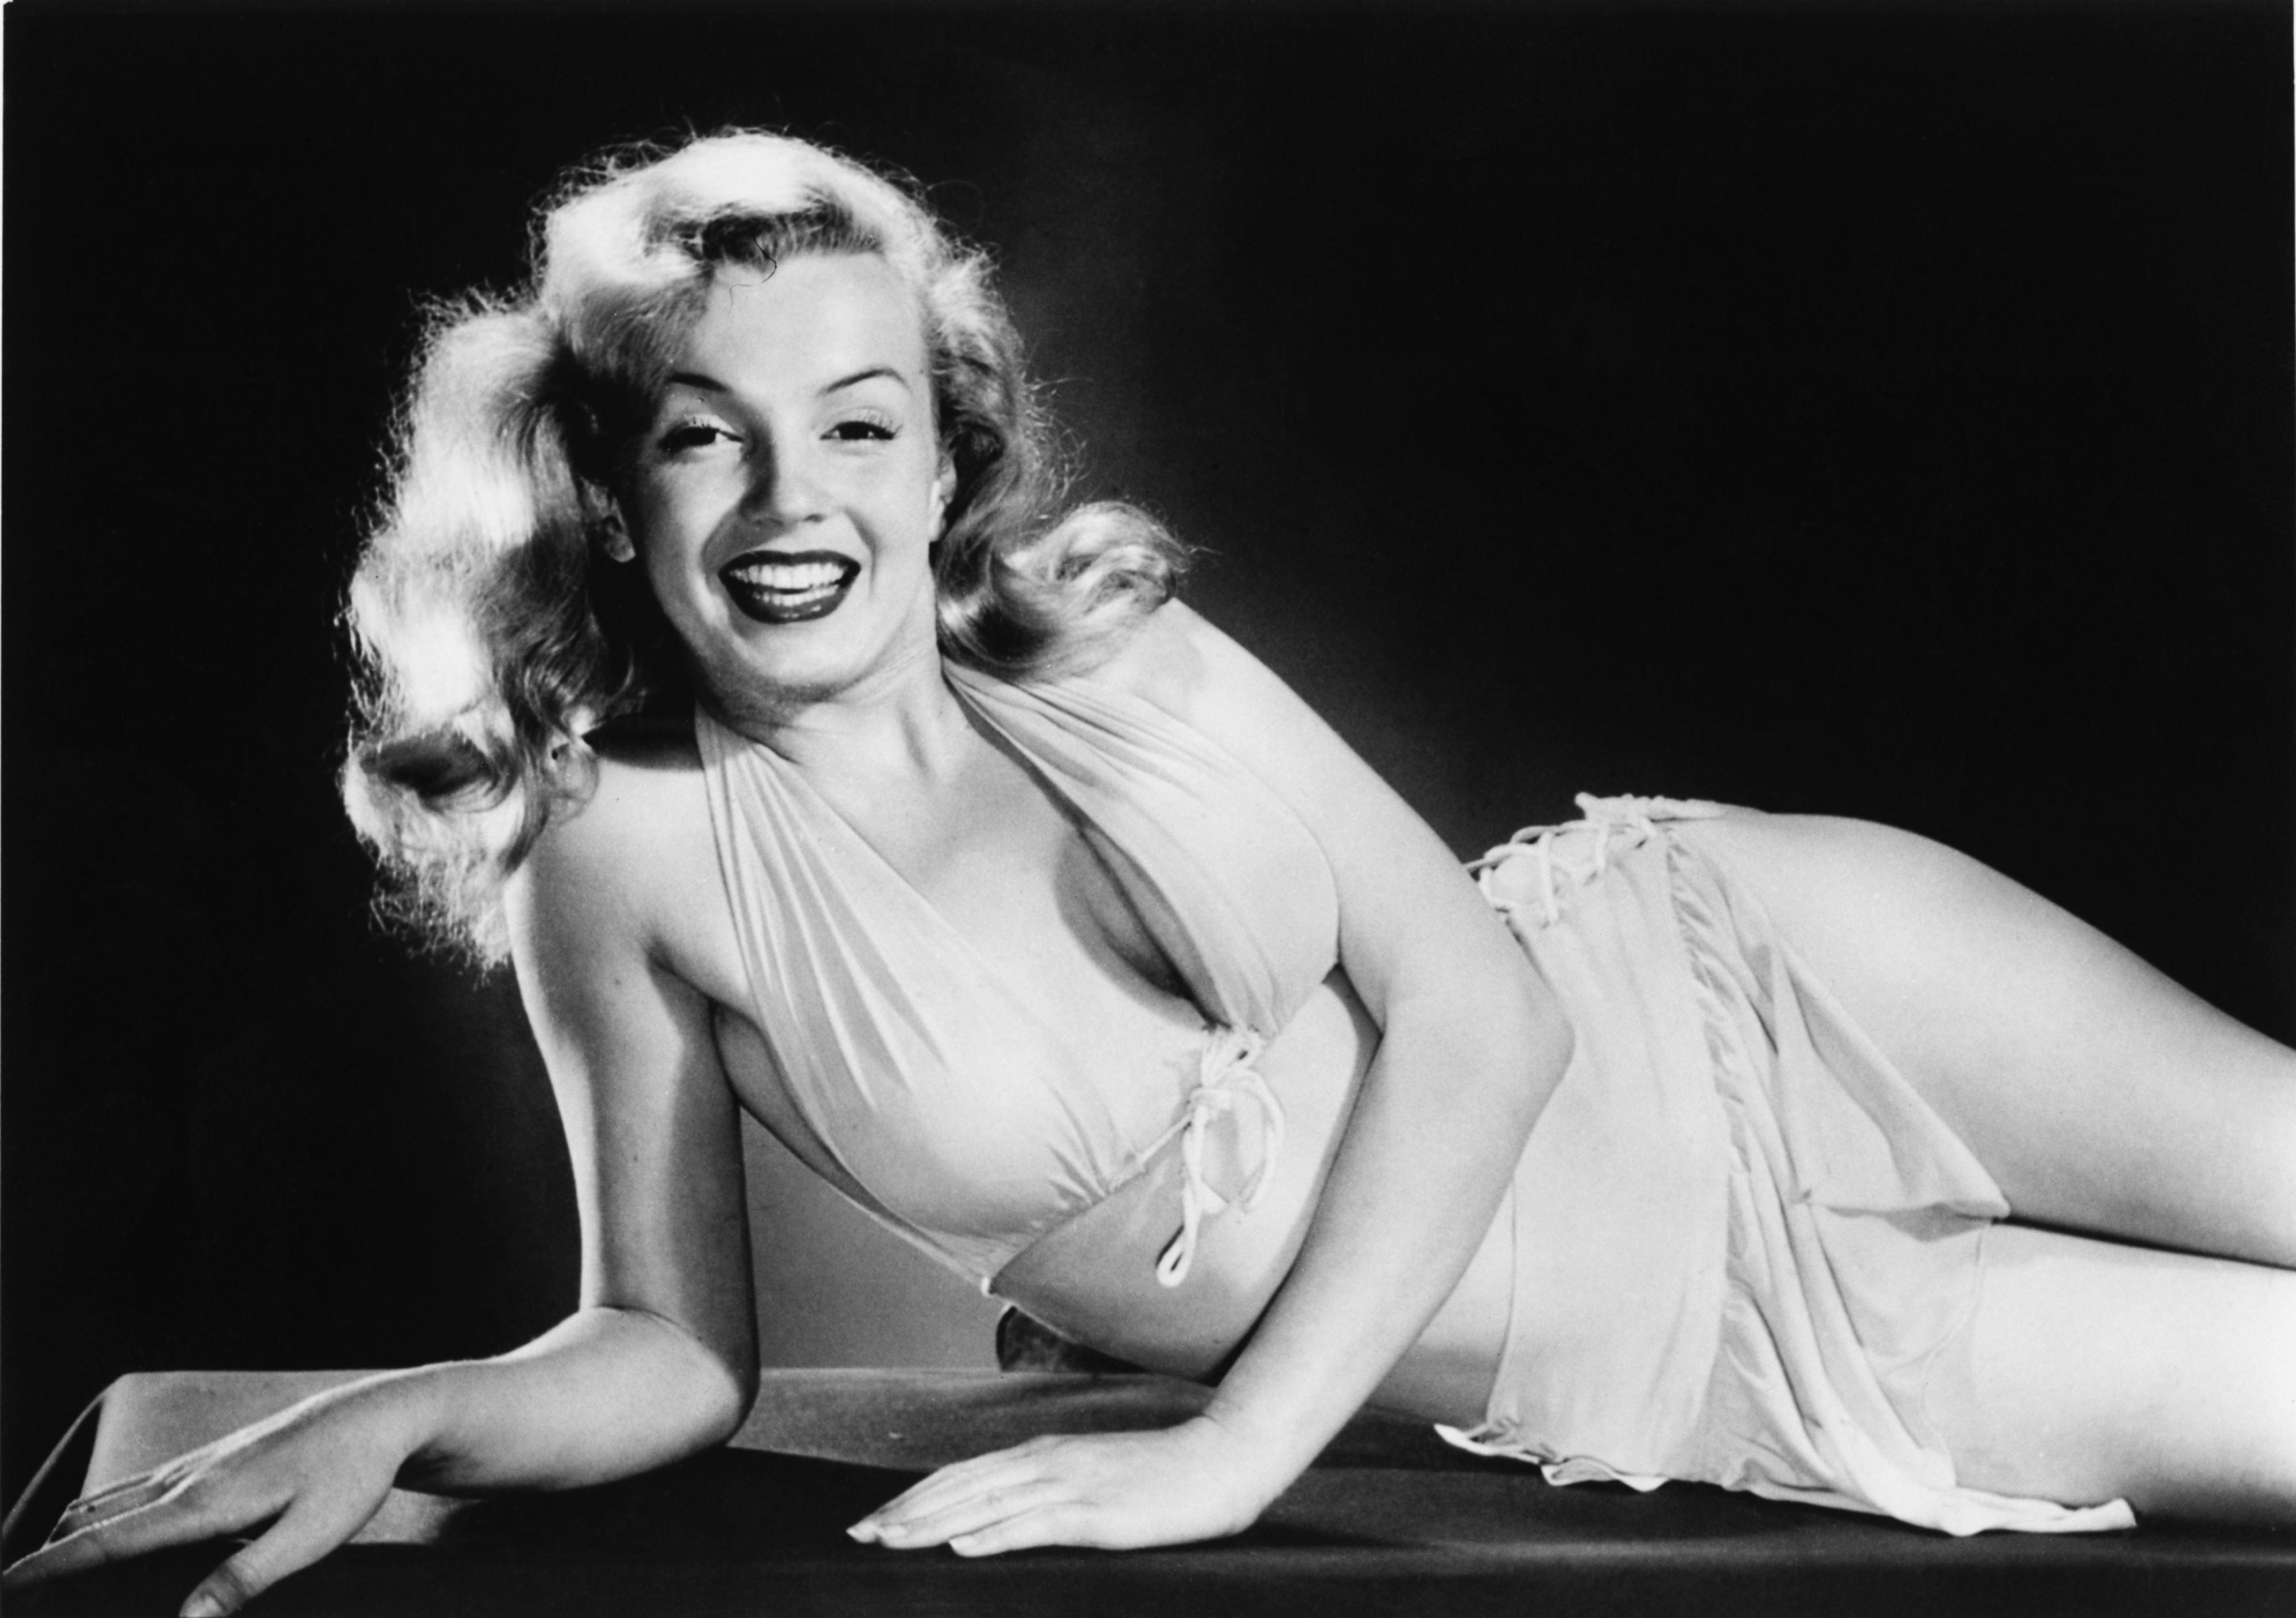 Subastarán inéditas fotos íntimas de Marilyn Monroe